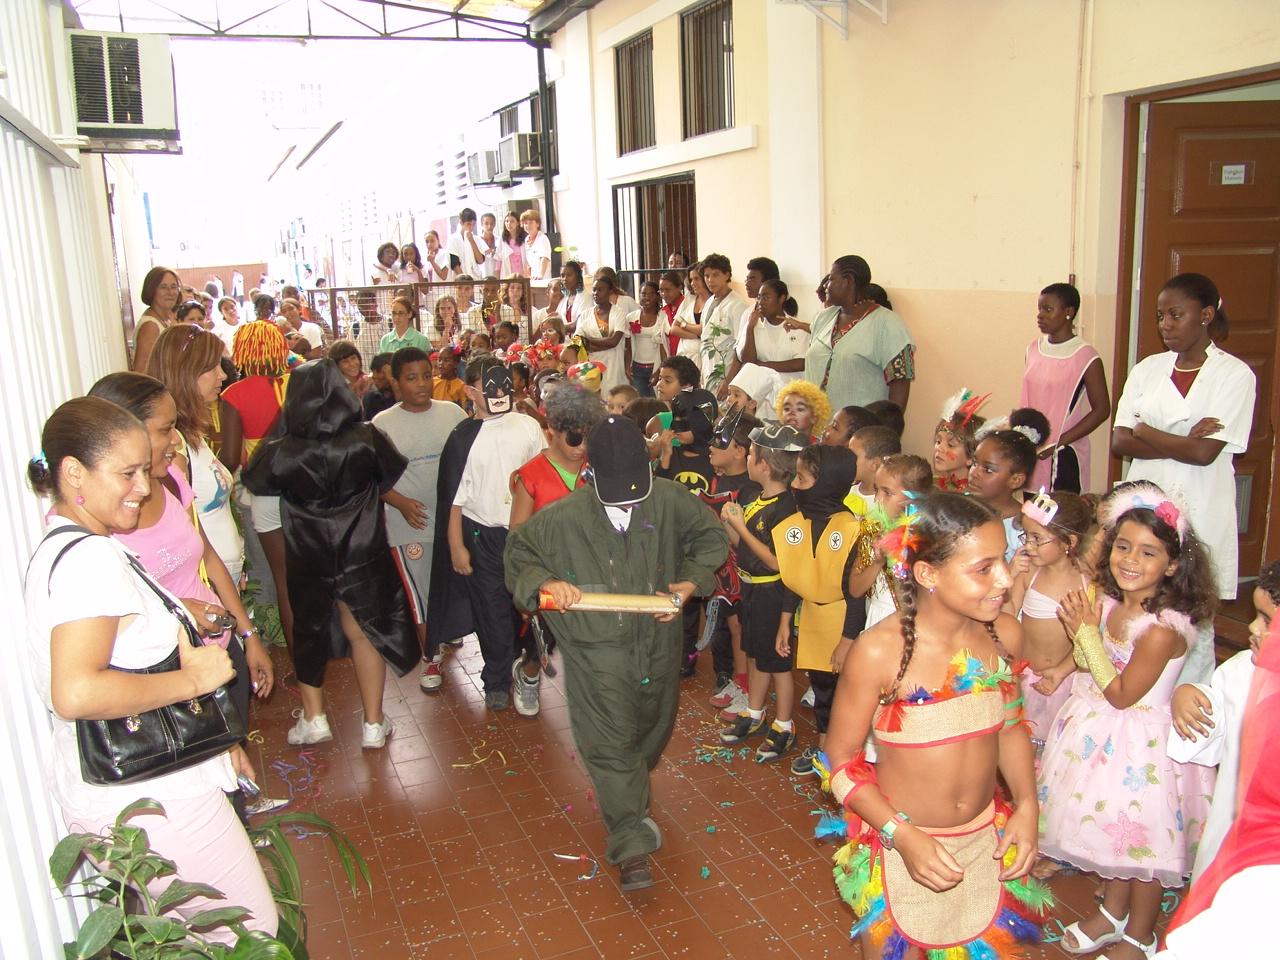 Carnaval 2004-2005